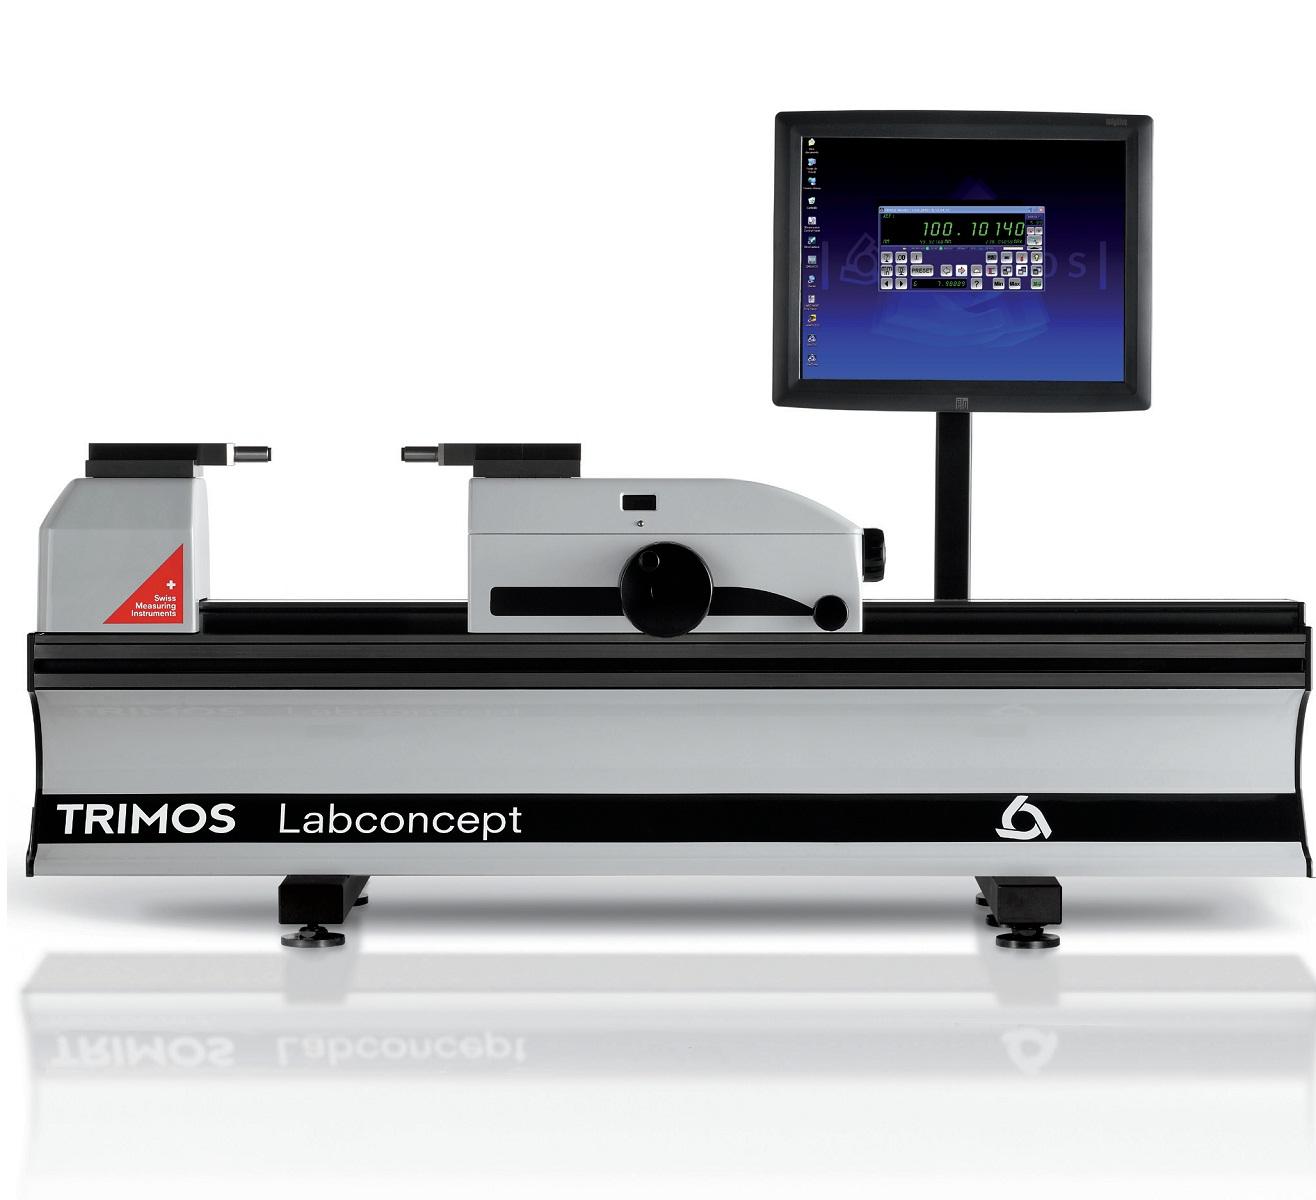 Trimos LABC万能测长机_效率高_隔热 | 瑞士丹青官方提供